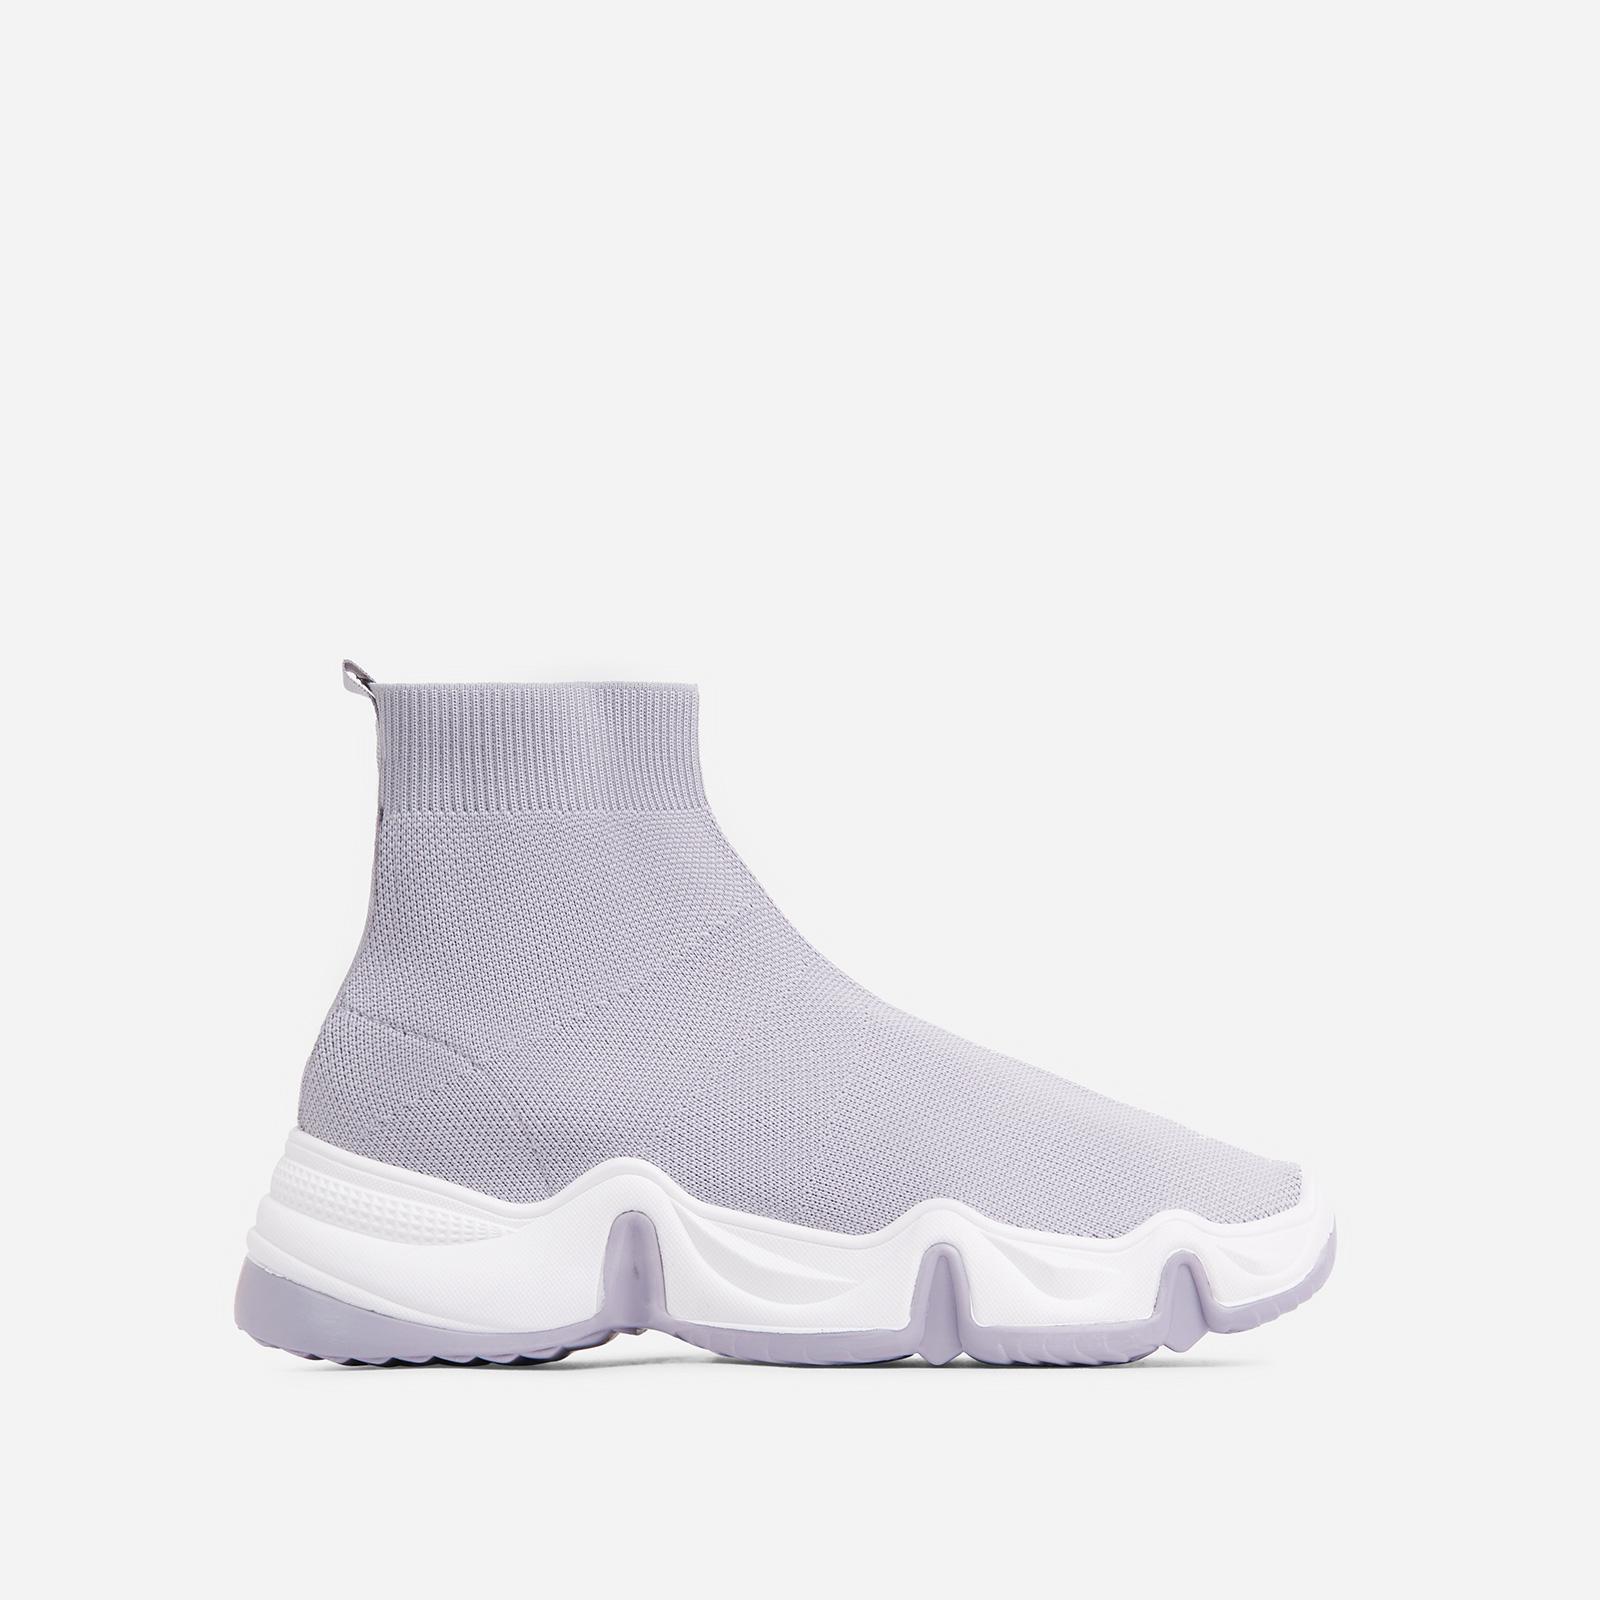 EGO Atlas Chunky Sole Sock Trainer In Grey Knit, Grey  - female - Size: 5